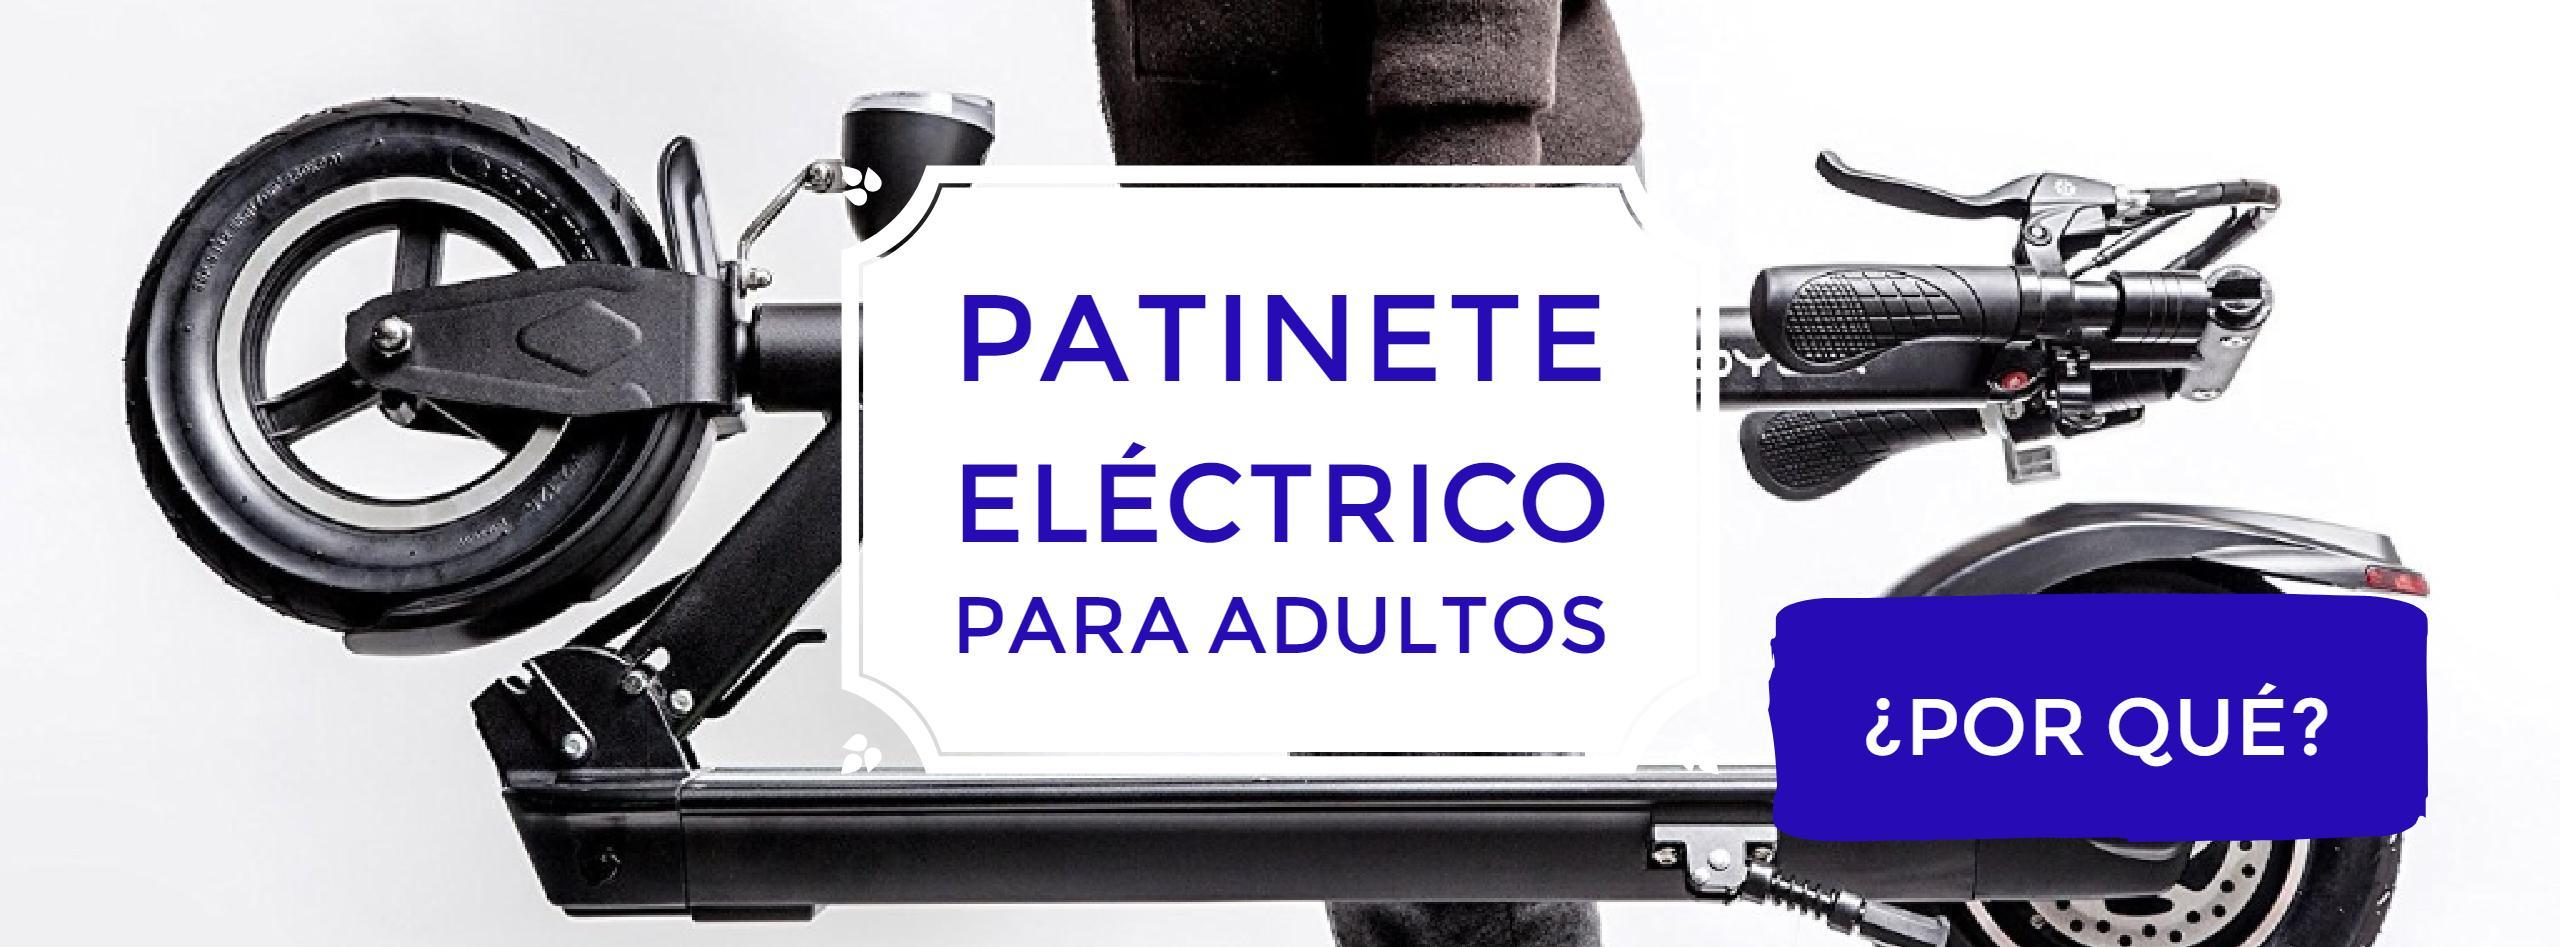 6a099972f Patinetes eléctricos para adultos